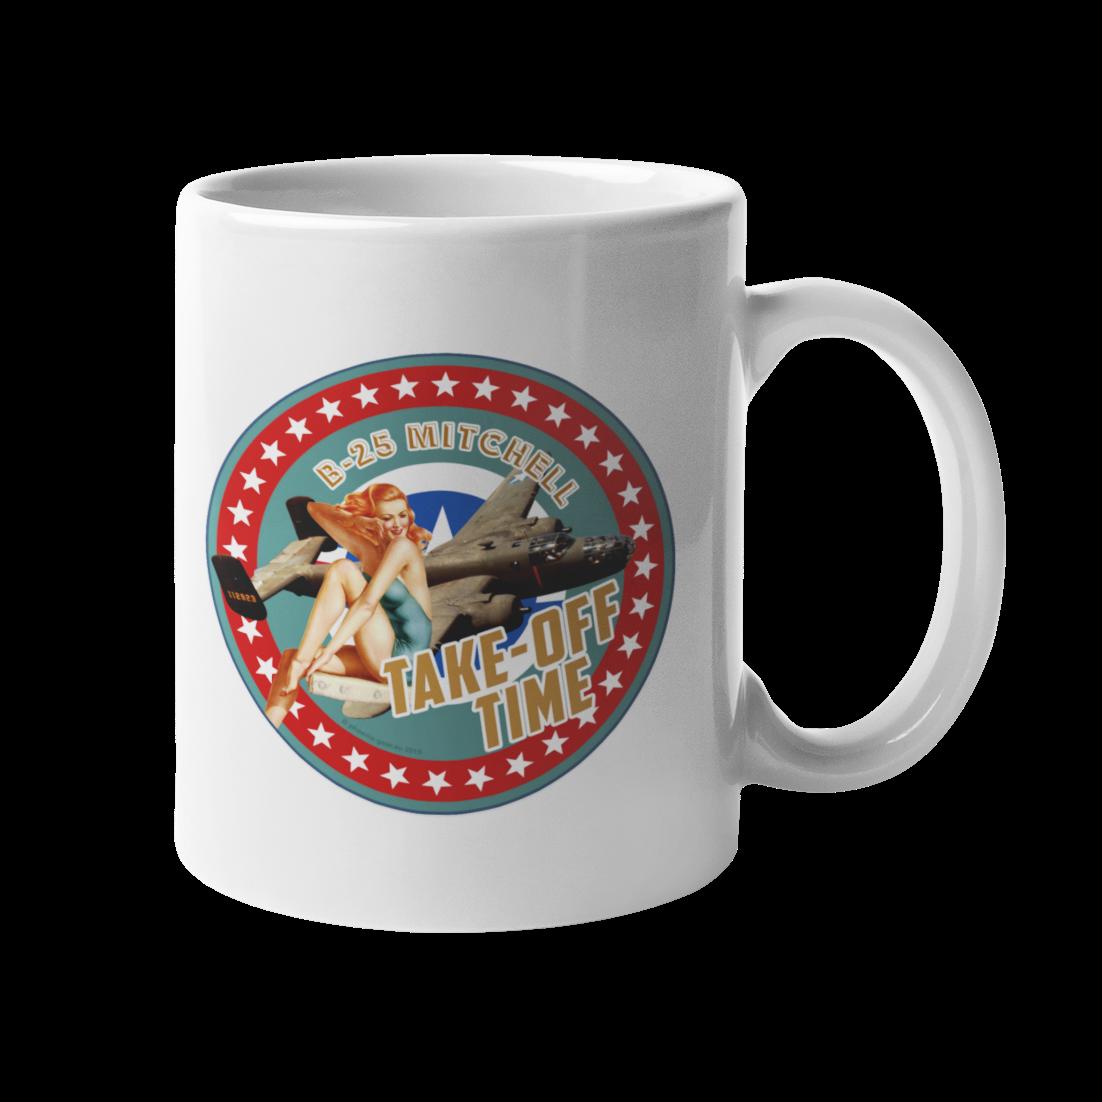 Mug B25-Michell